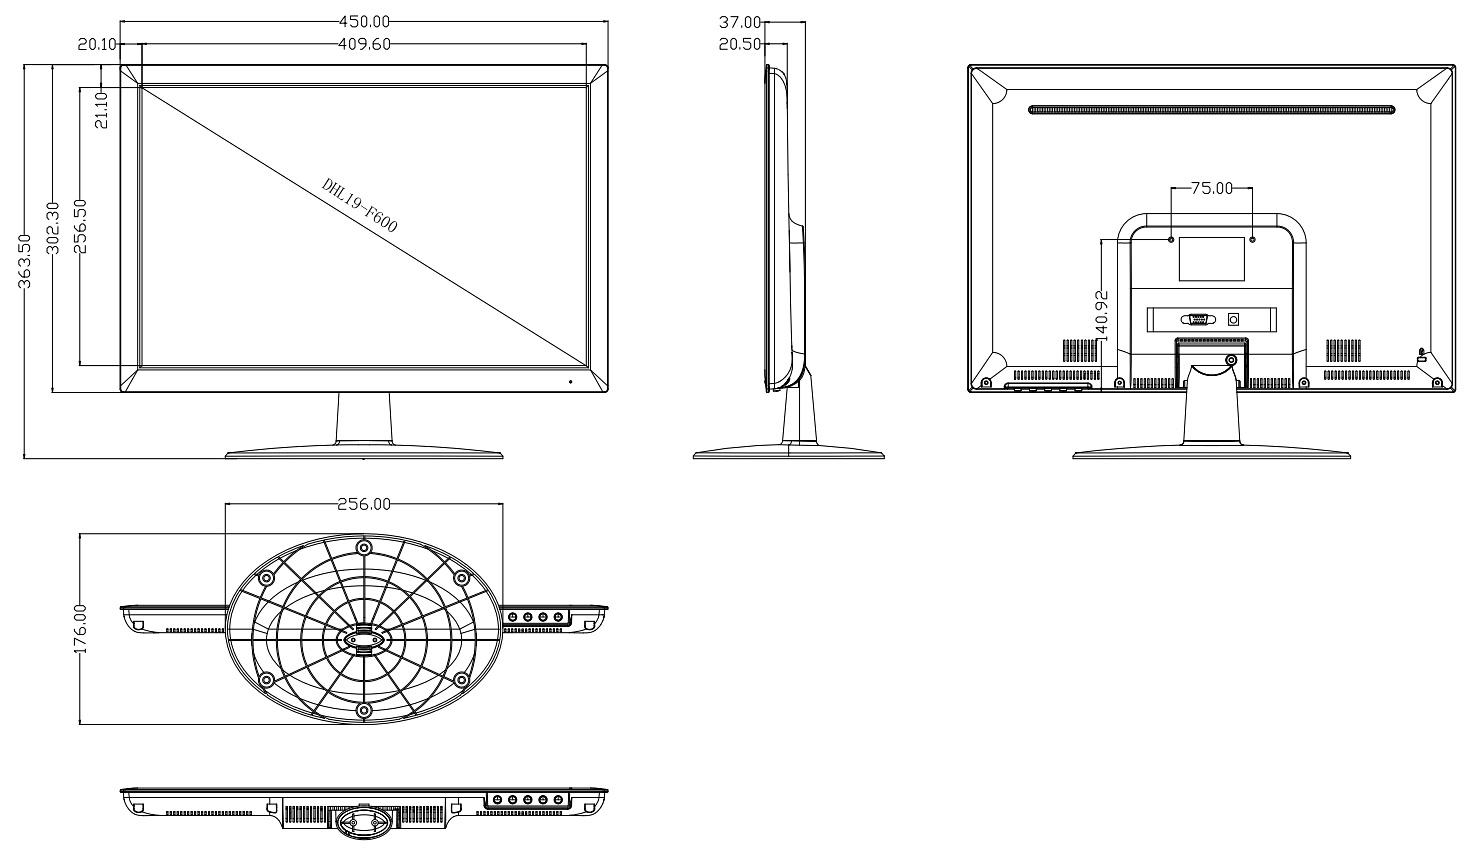 Monitor Vga Dhl19 F600 19 Led Dahua Monitoare Lcd Delta Veti Plug Wiring Diagram Dimensiuni